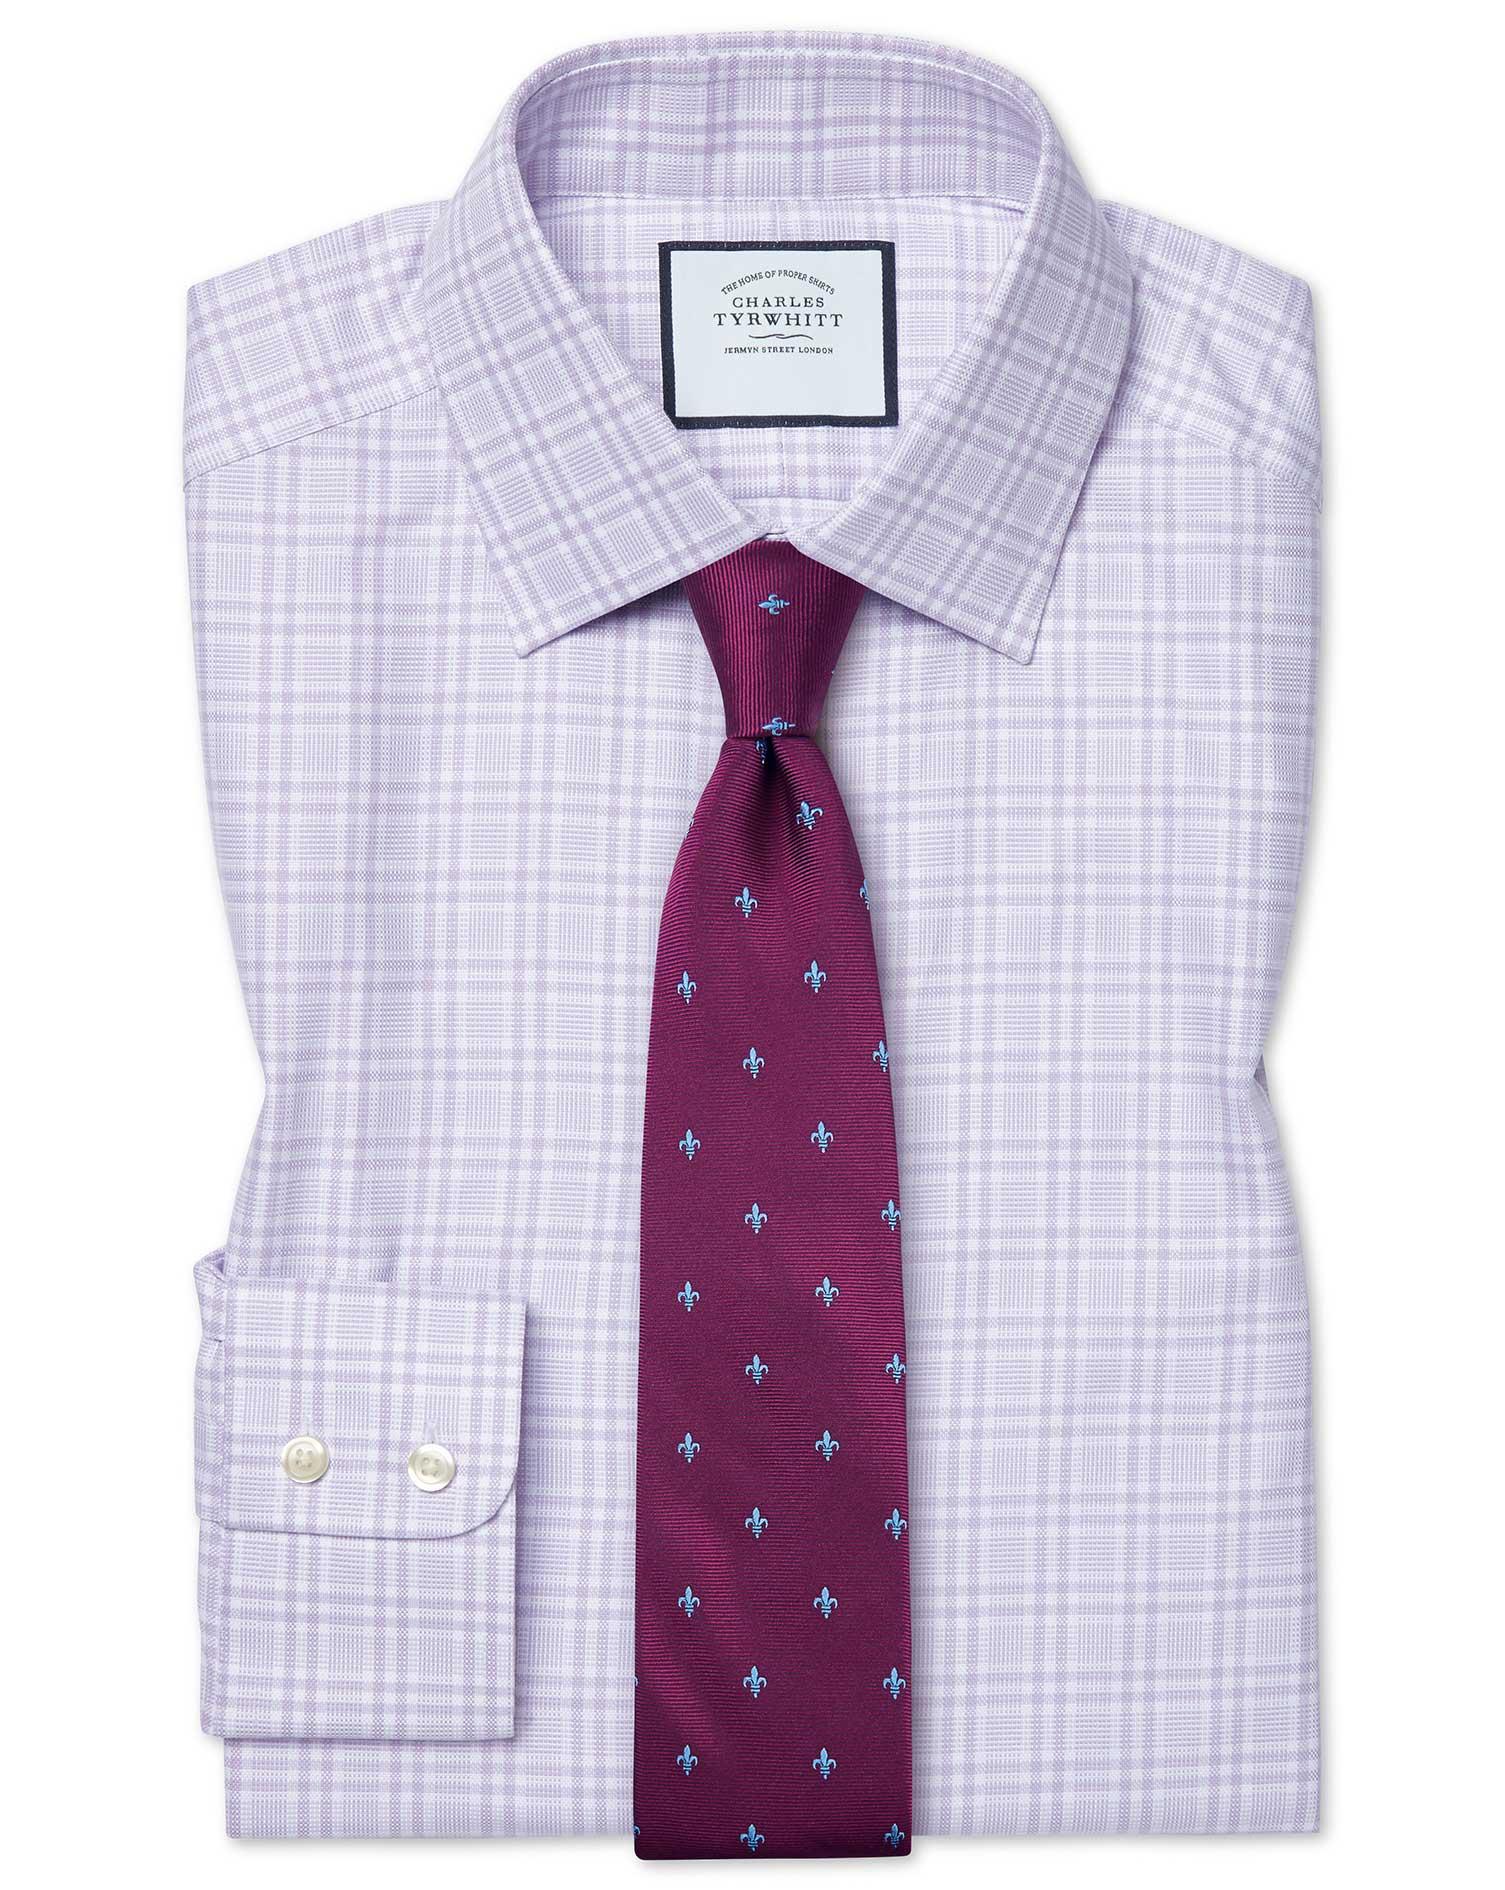 Cotton Slim Fit Brushed-Back Basketweave Lilac Check Shirt